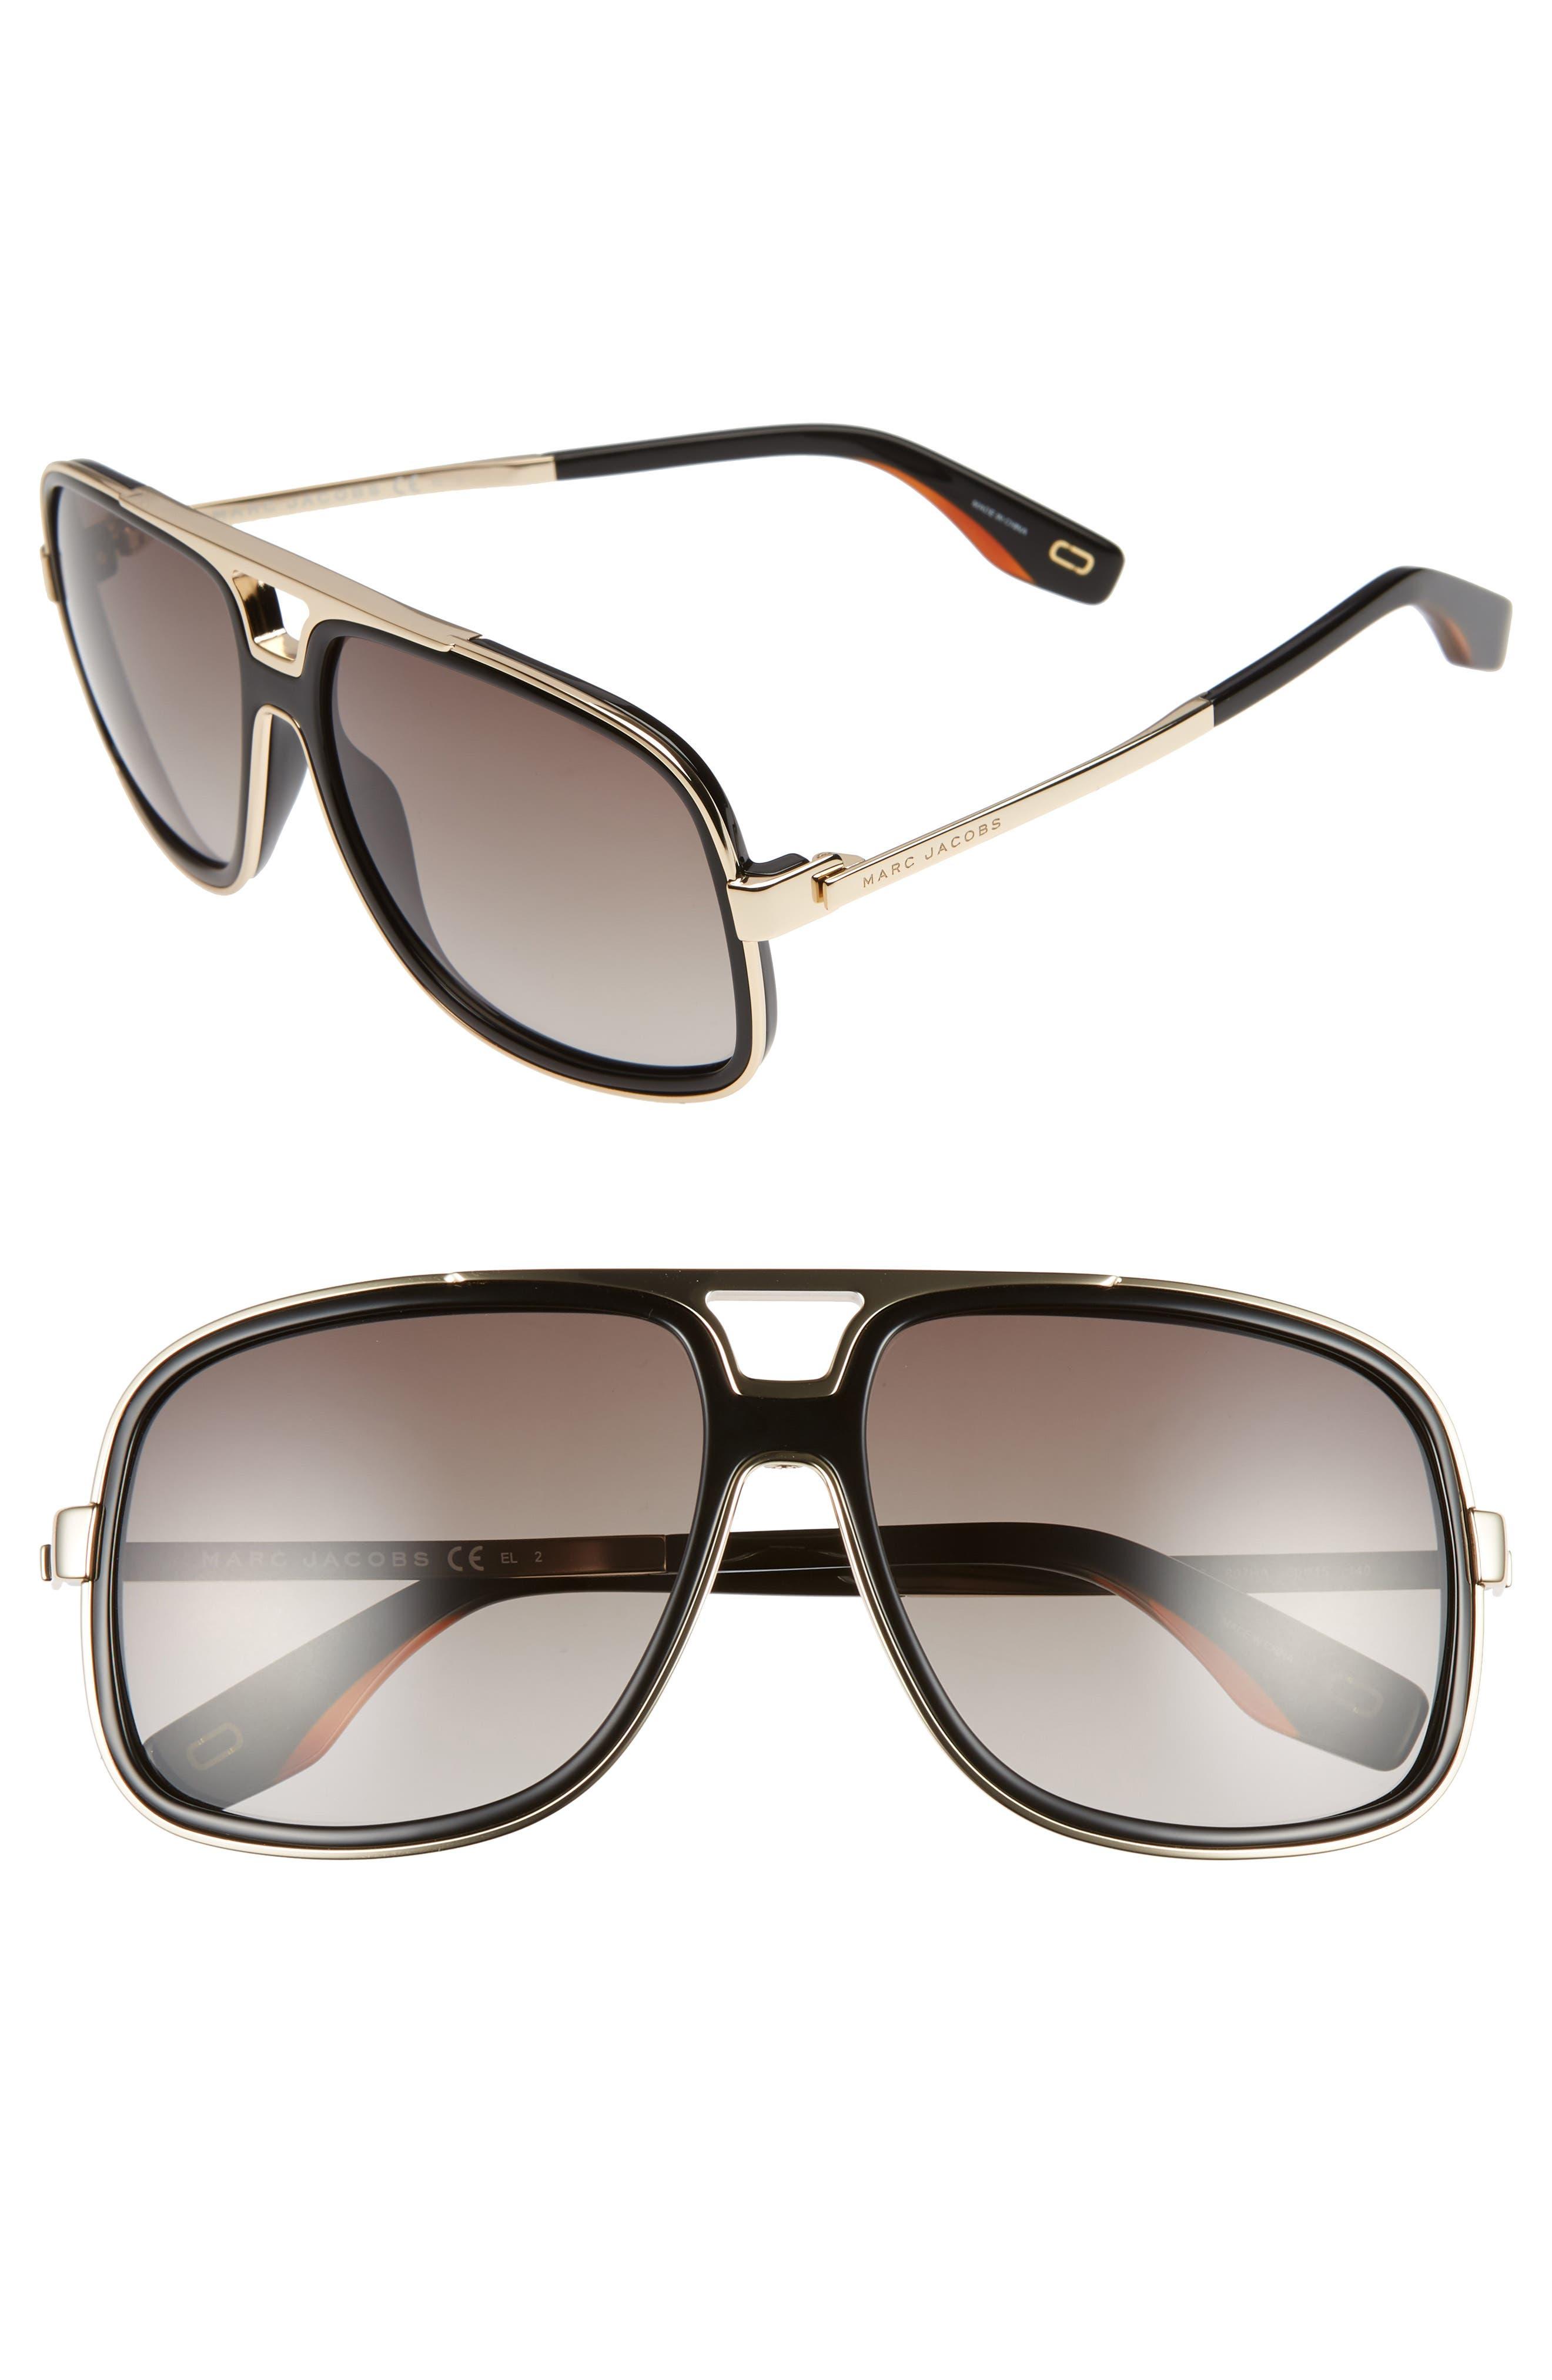 Carrera Eyewear 5m Aviator Sunglasses - Black/burgundy